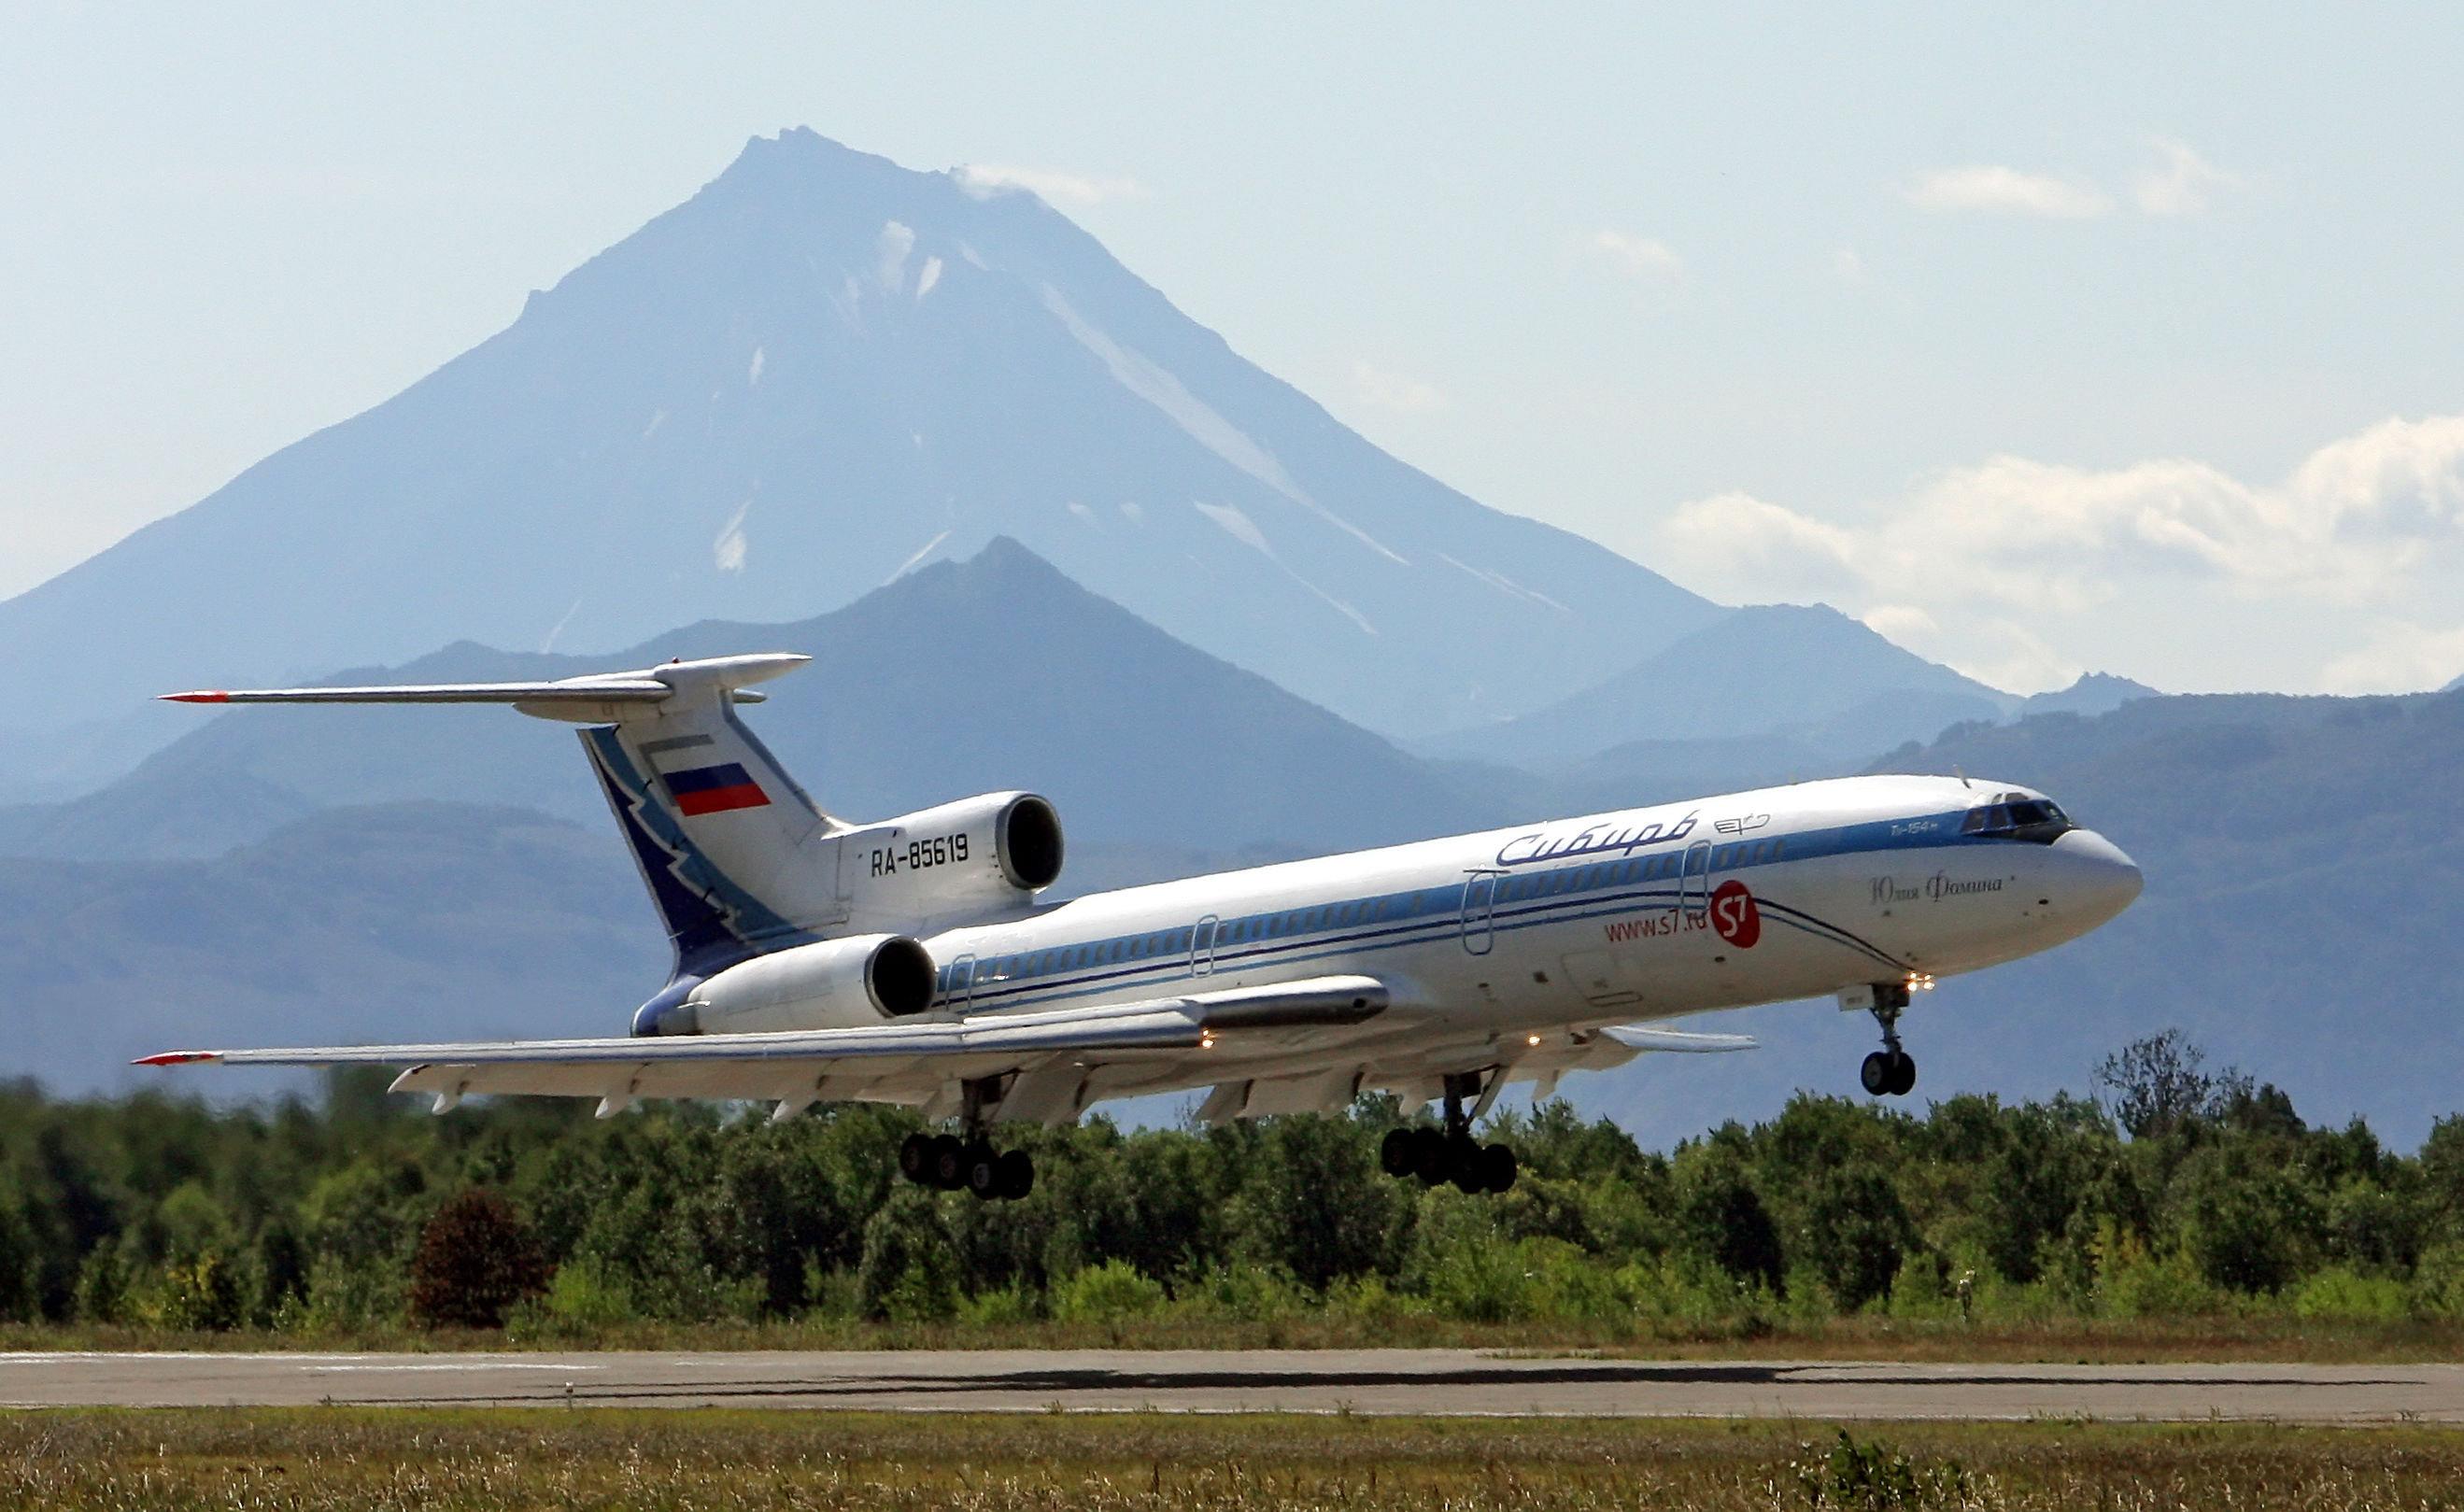 Tu-154 à la péninsule du Kamtchatka